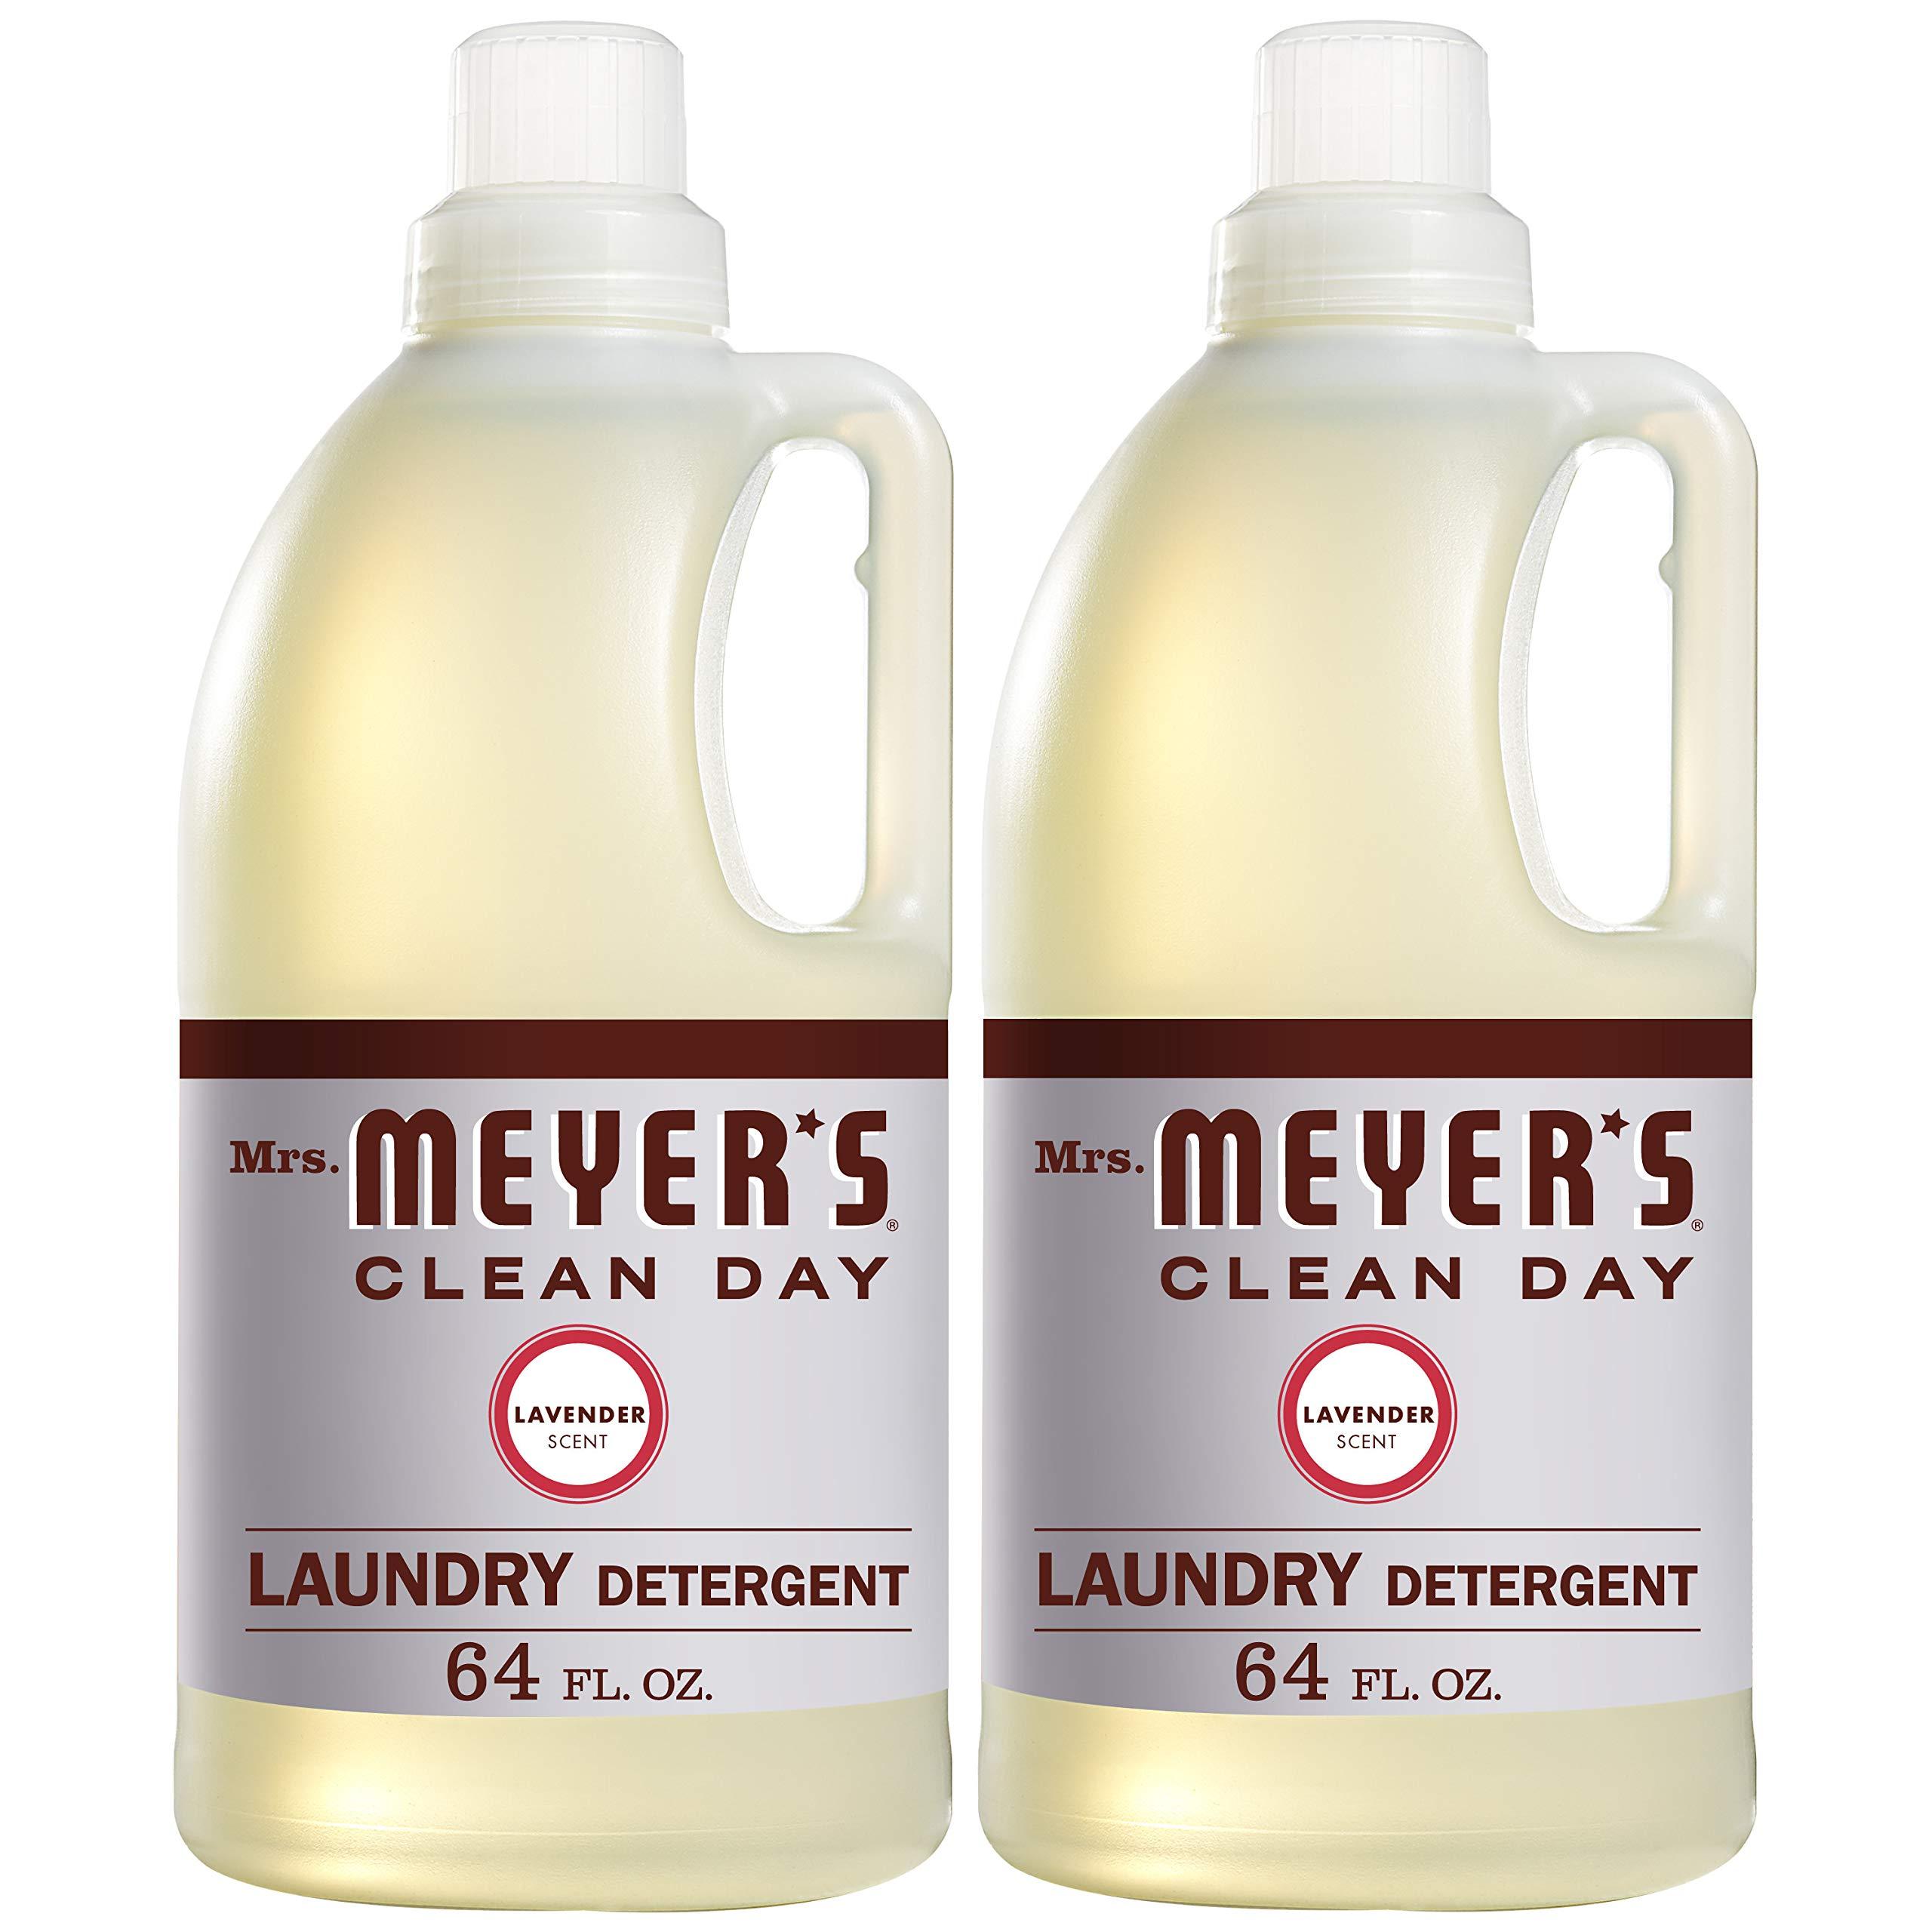 Mrs. Meyer's Laundry Detergent, Lavender, 64 fl oz (2 ct) by Mrs. Meyer's Clean Day